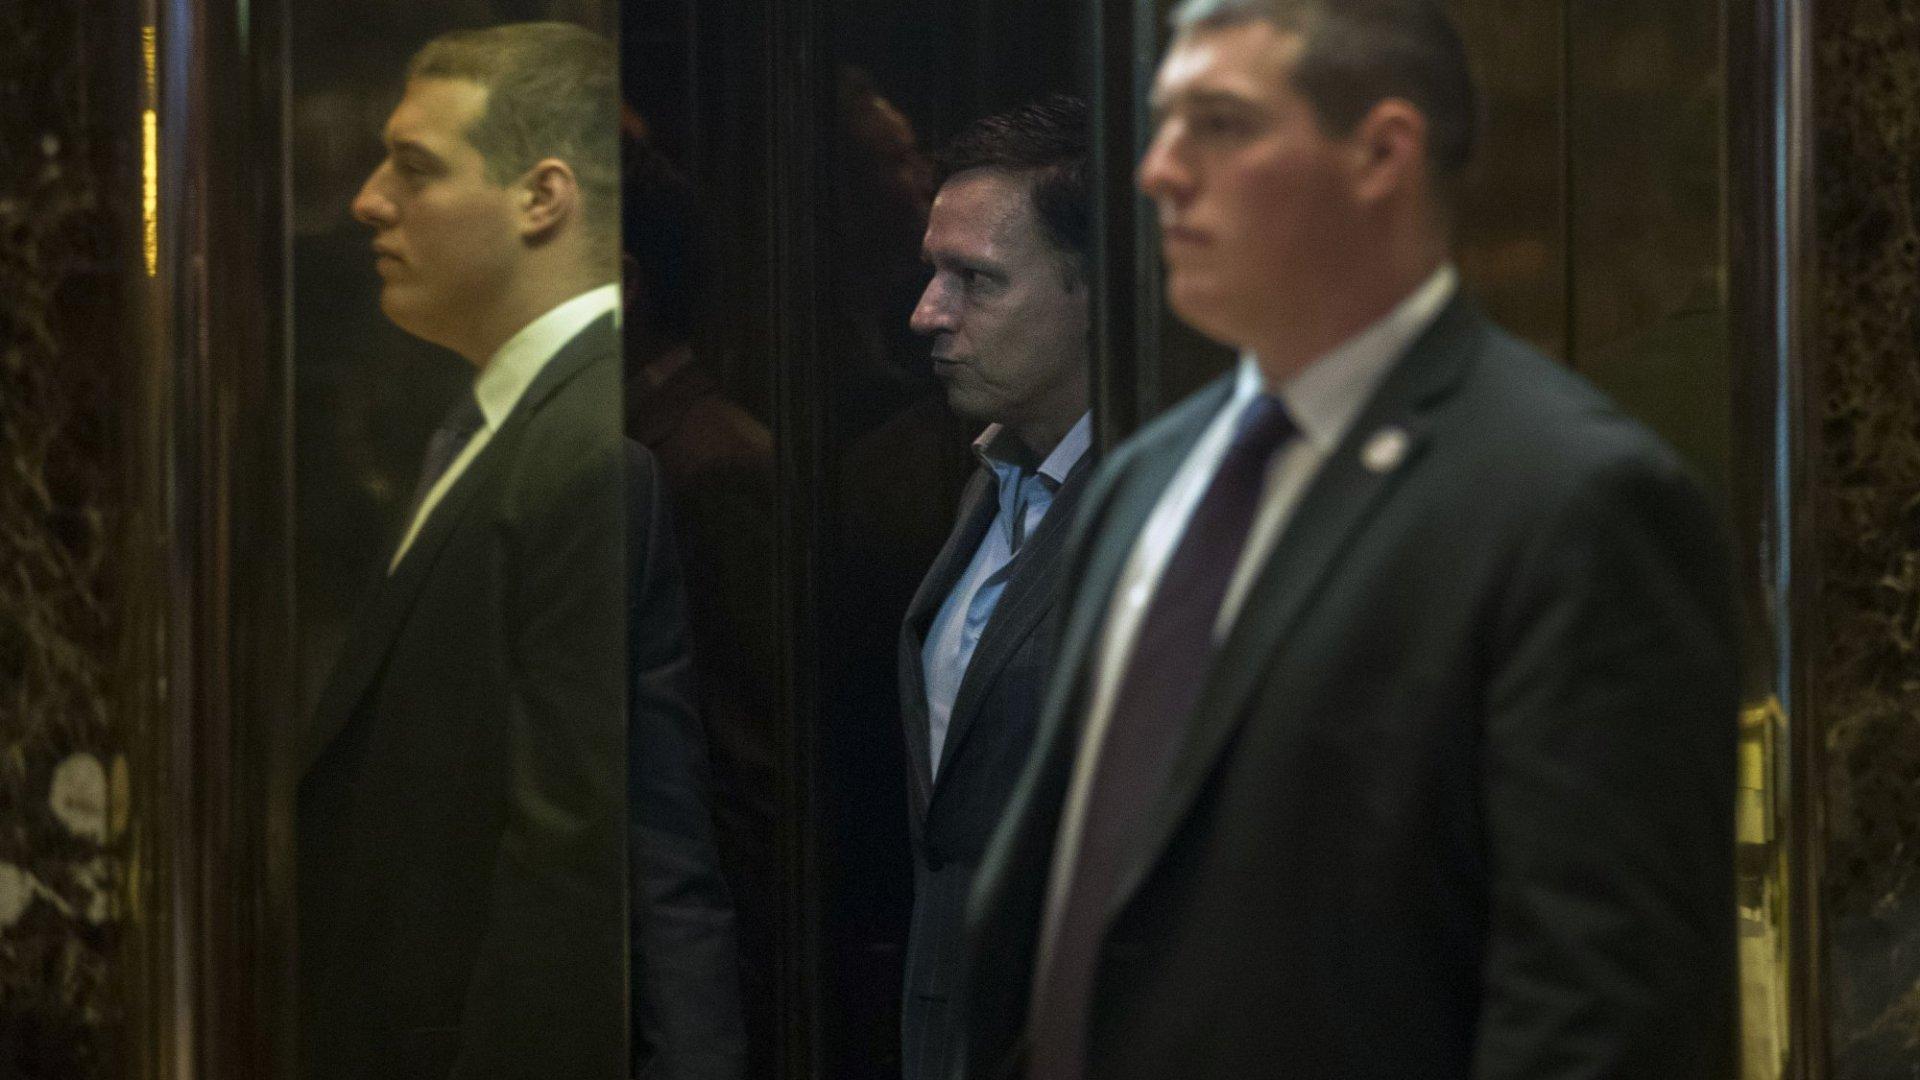 Peter Thiel (in elevator).